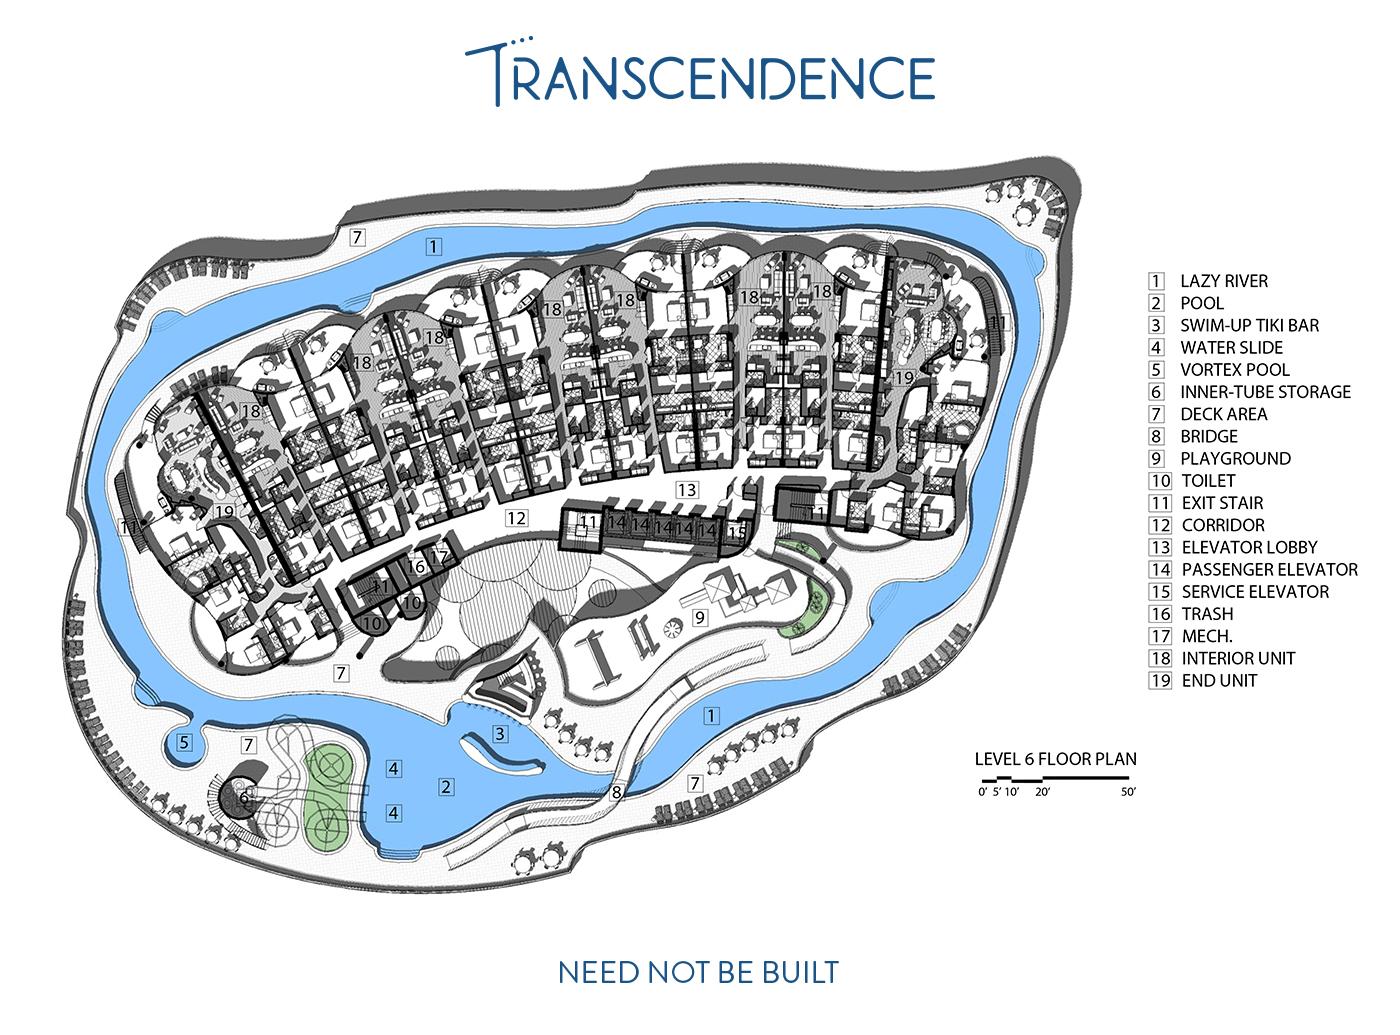 Transcendence Condos Seamitchell.com